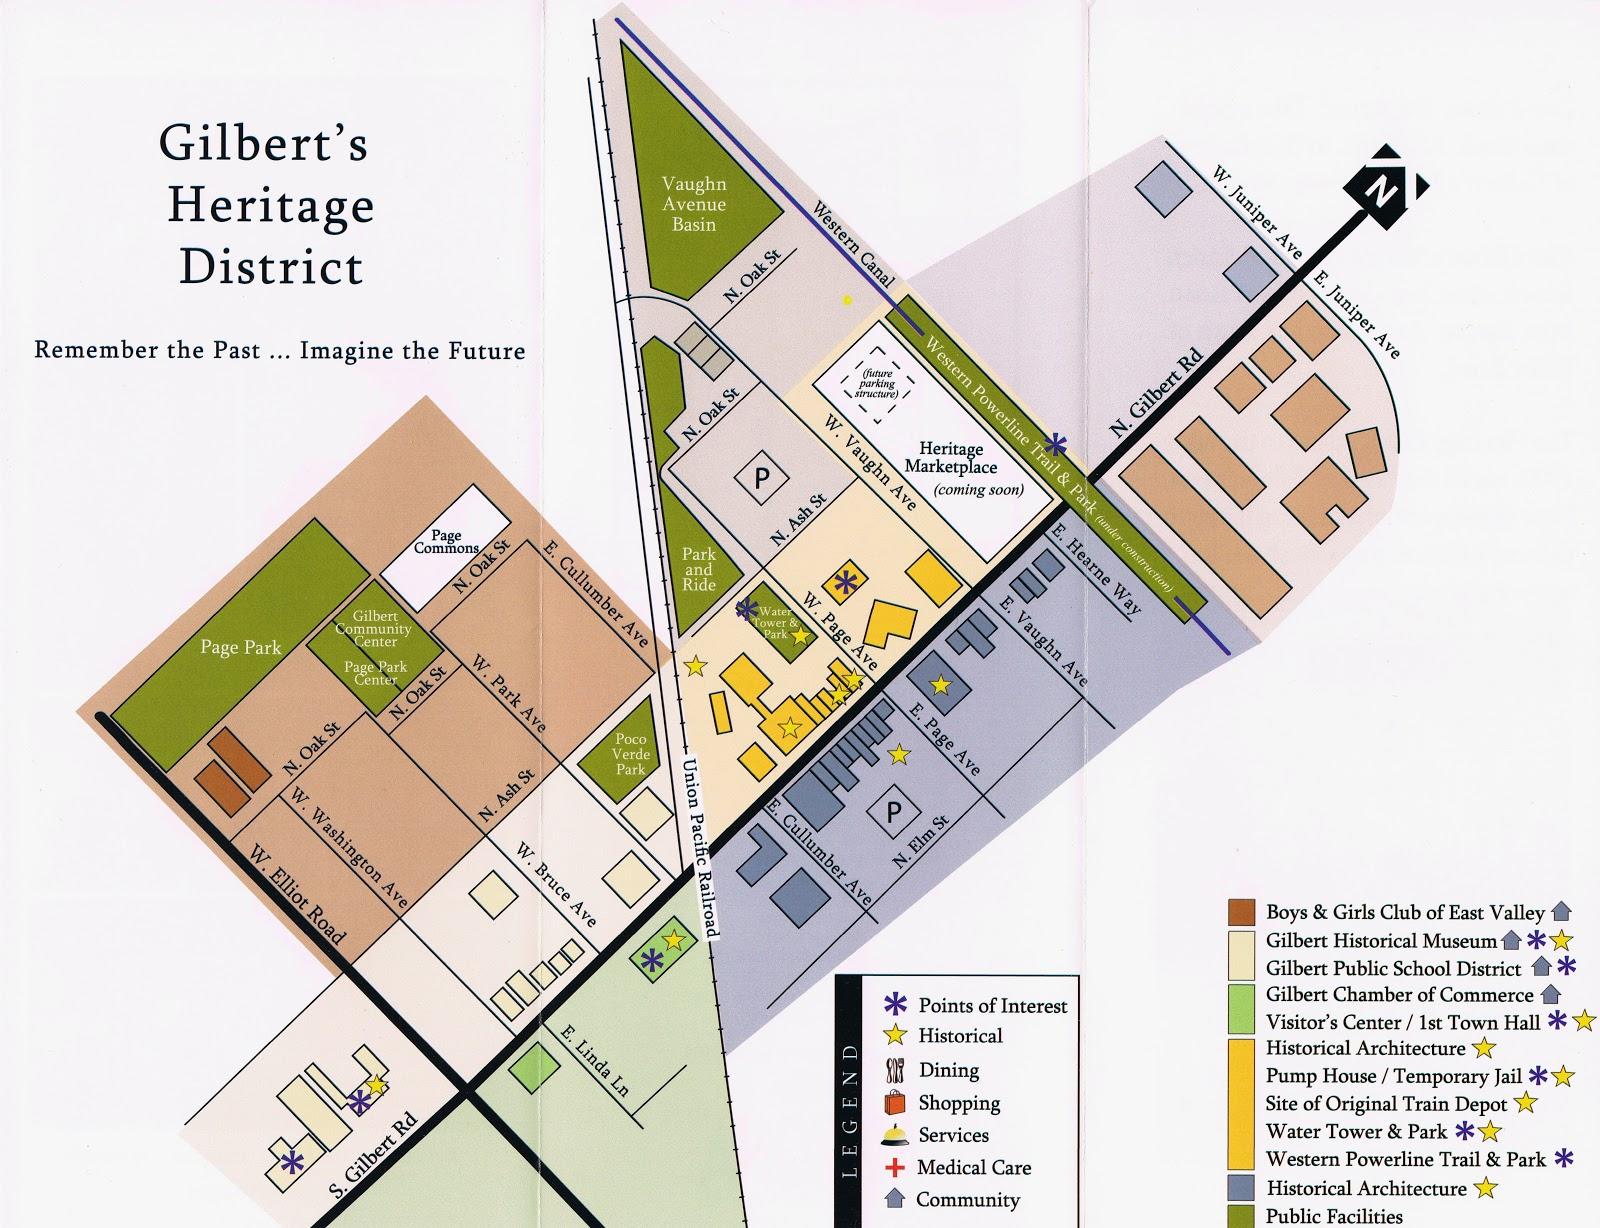 Downtown gilbert heritage district phoenix az real estate 480721 downtown gilbert heritage district map fandeluxe Image collections